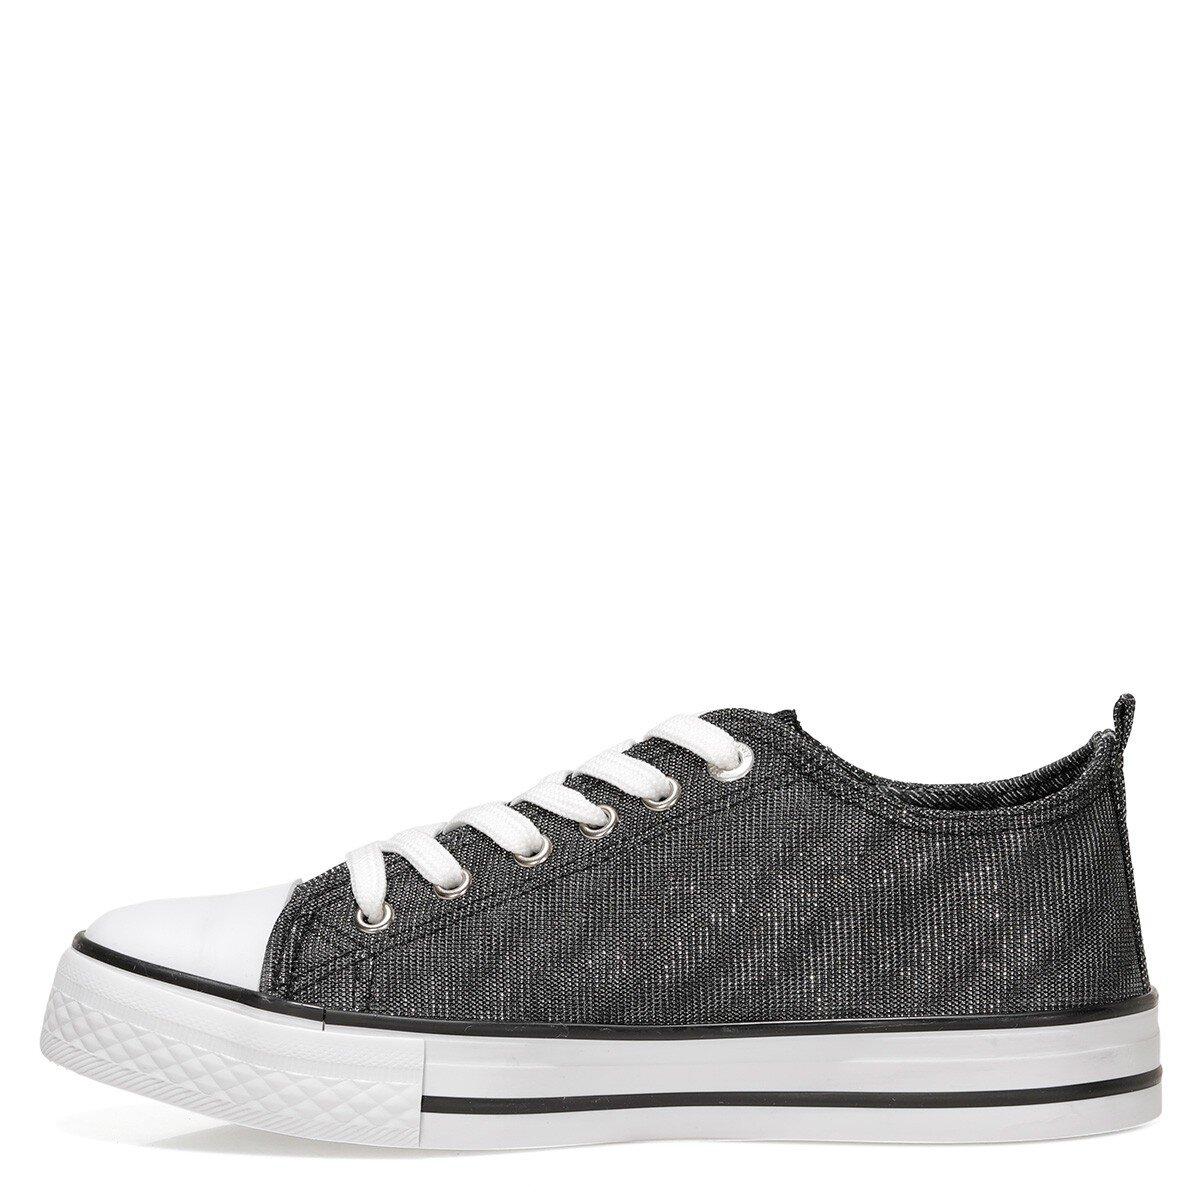 CONFY 1FX Siyah Kadın Sneaker